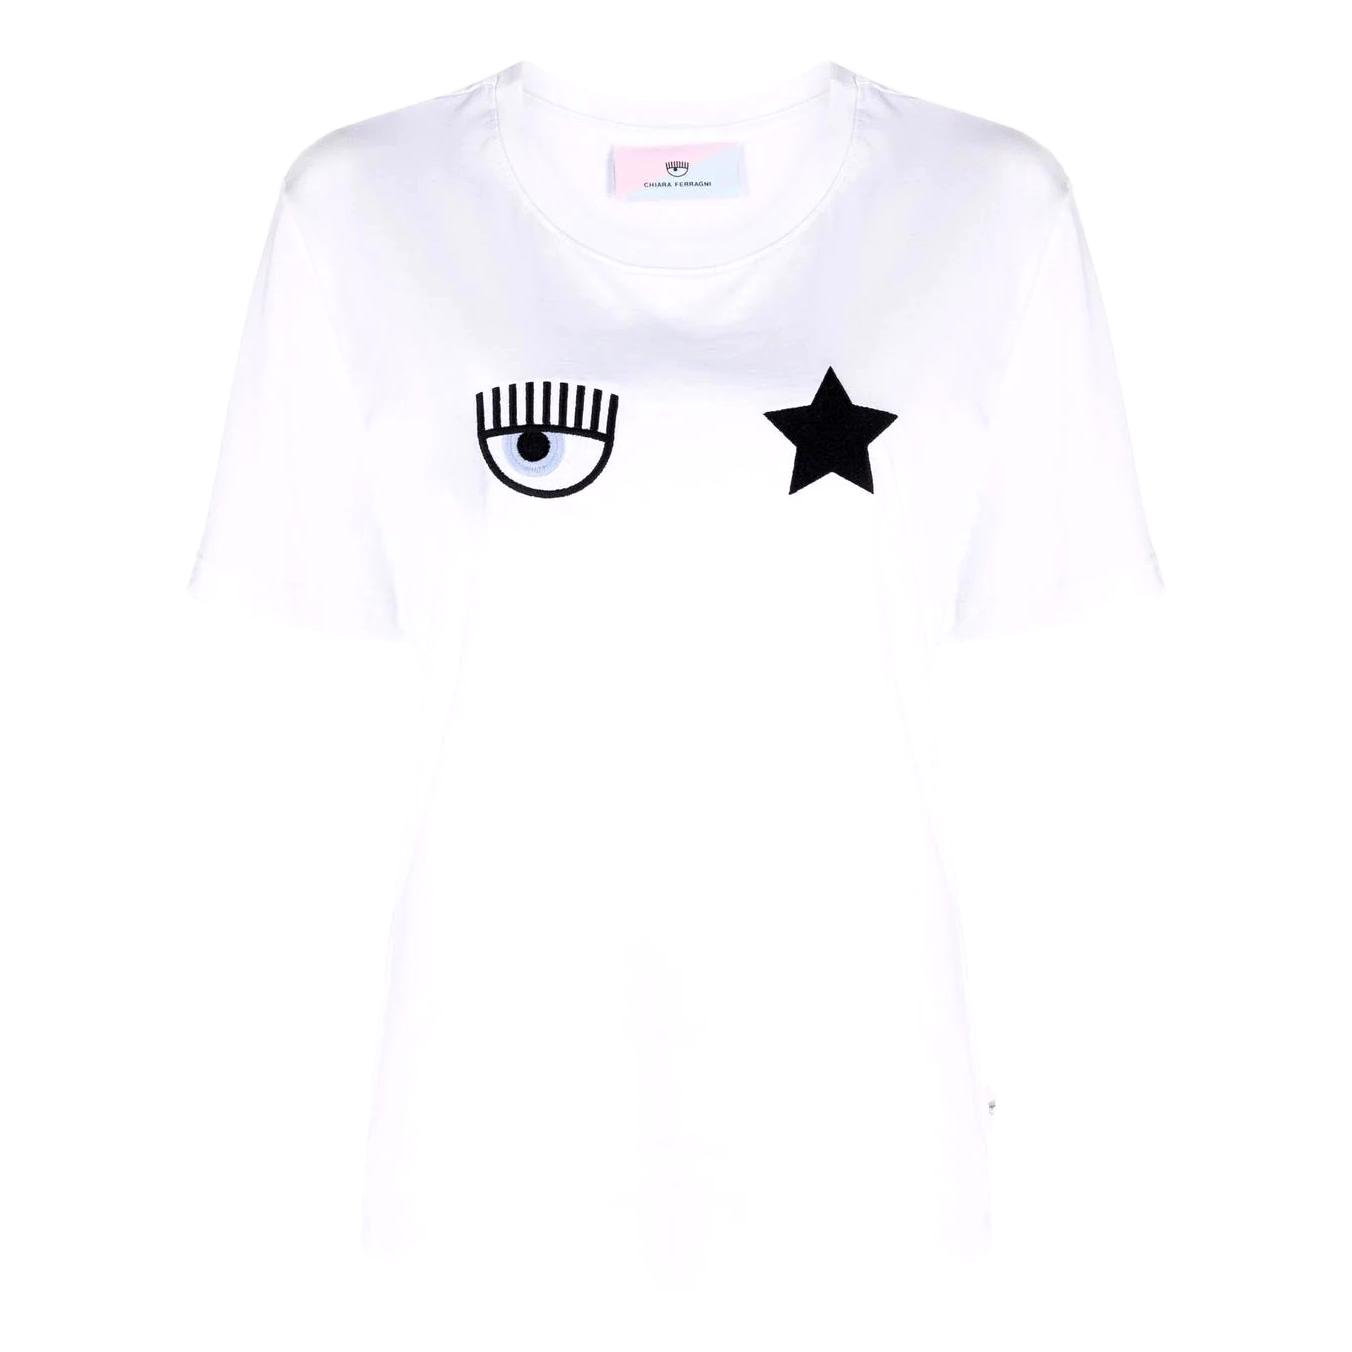 T-shirt with embroidery CHIARA FERRAGNI |  | 71CBHT01 CJC0T003